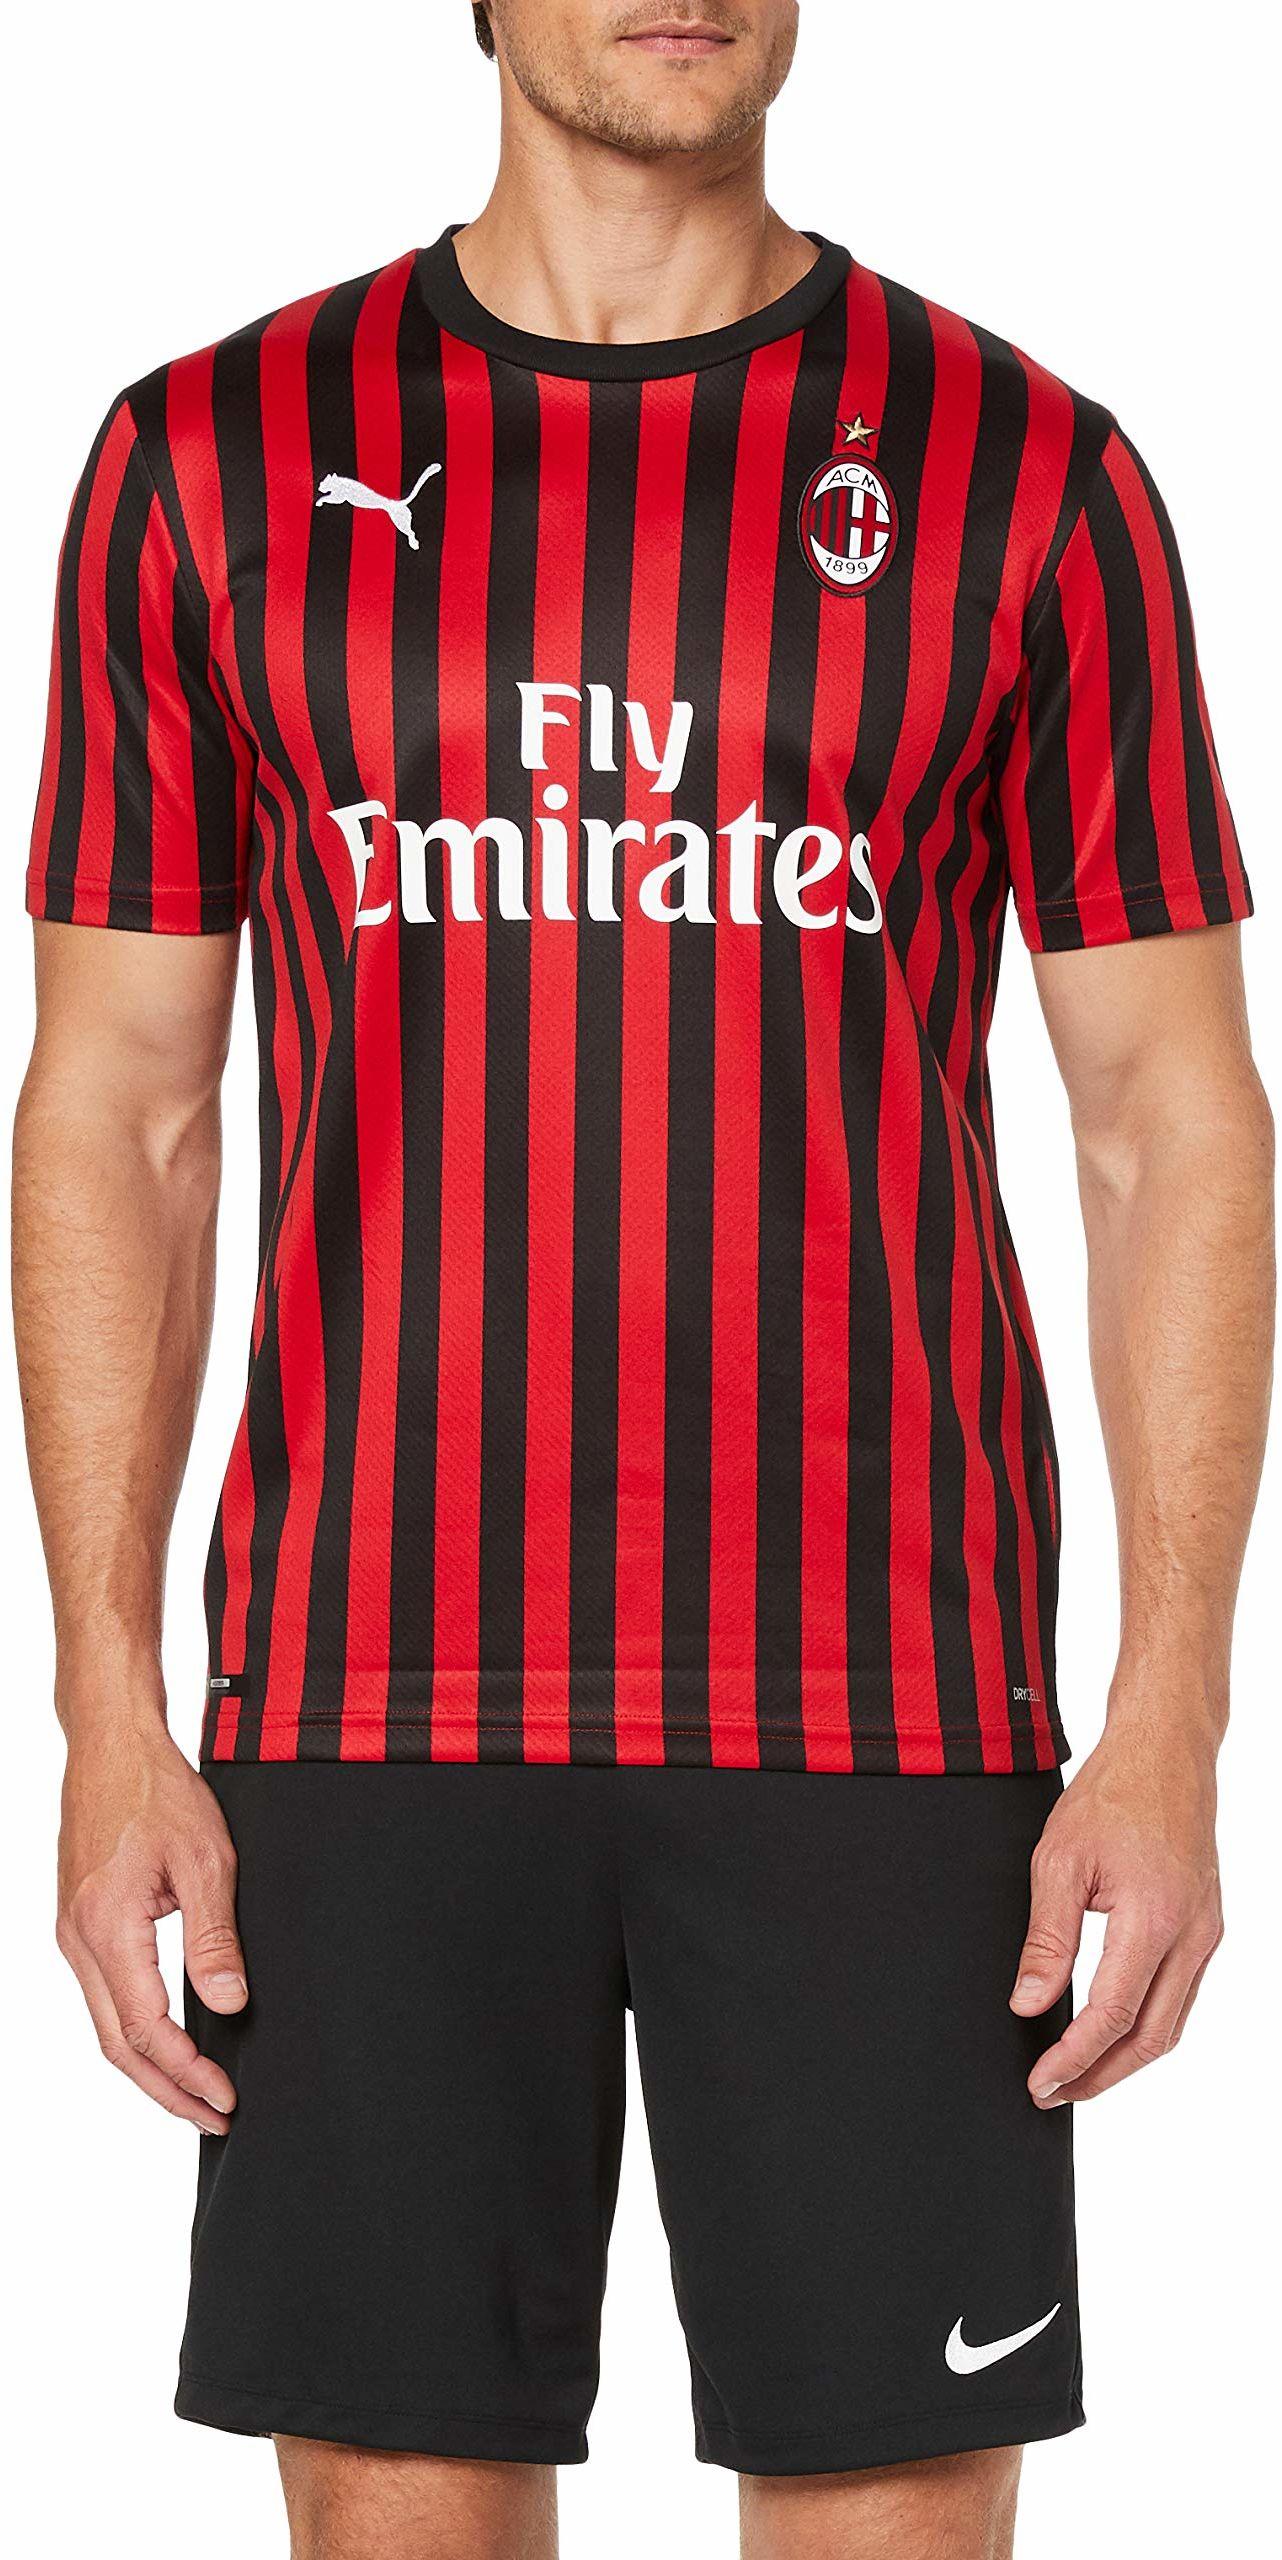 PUMA męska koszulka Ac Milan 1899 Home Shirt Repl. Top2 Player czerwony Tango Red/Puma Black L